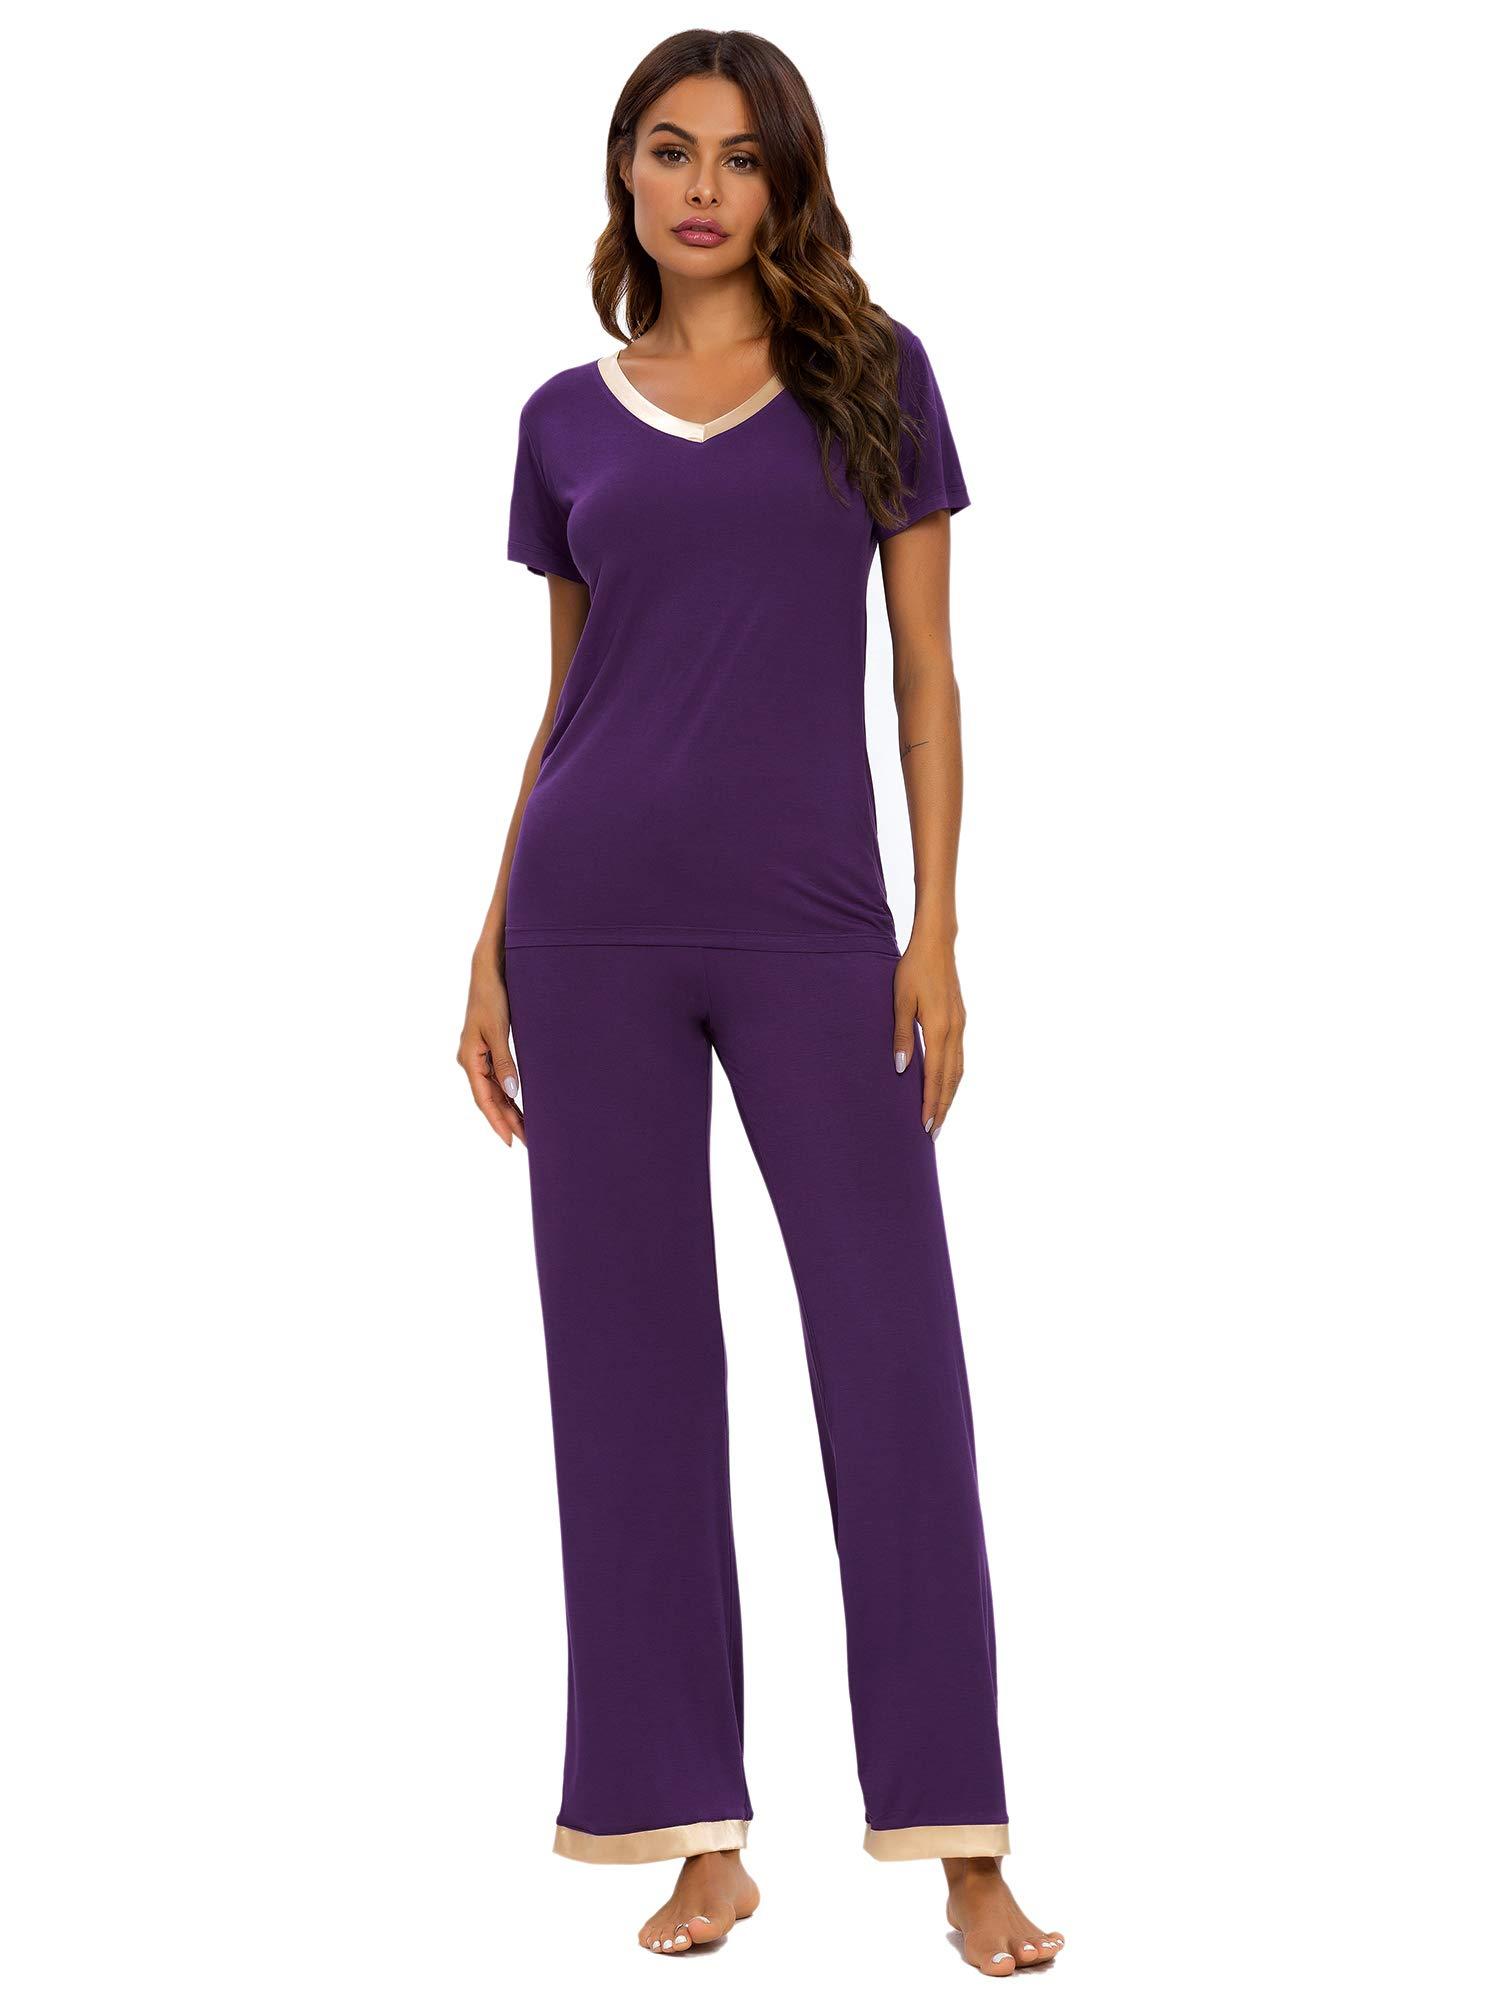 TIKTIK Womens Modal Pajama Set Comfy Sleepwear Short Sleeve Top with Pants Pjs Petite Plus Size S-4XL